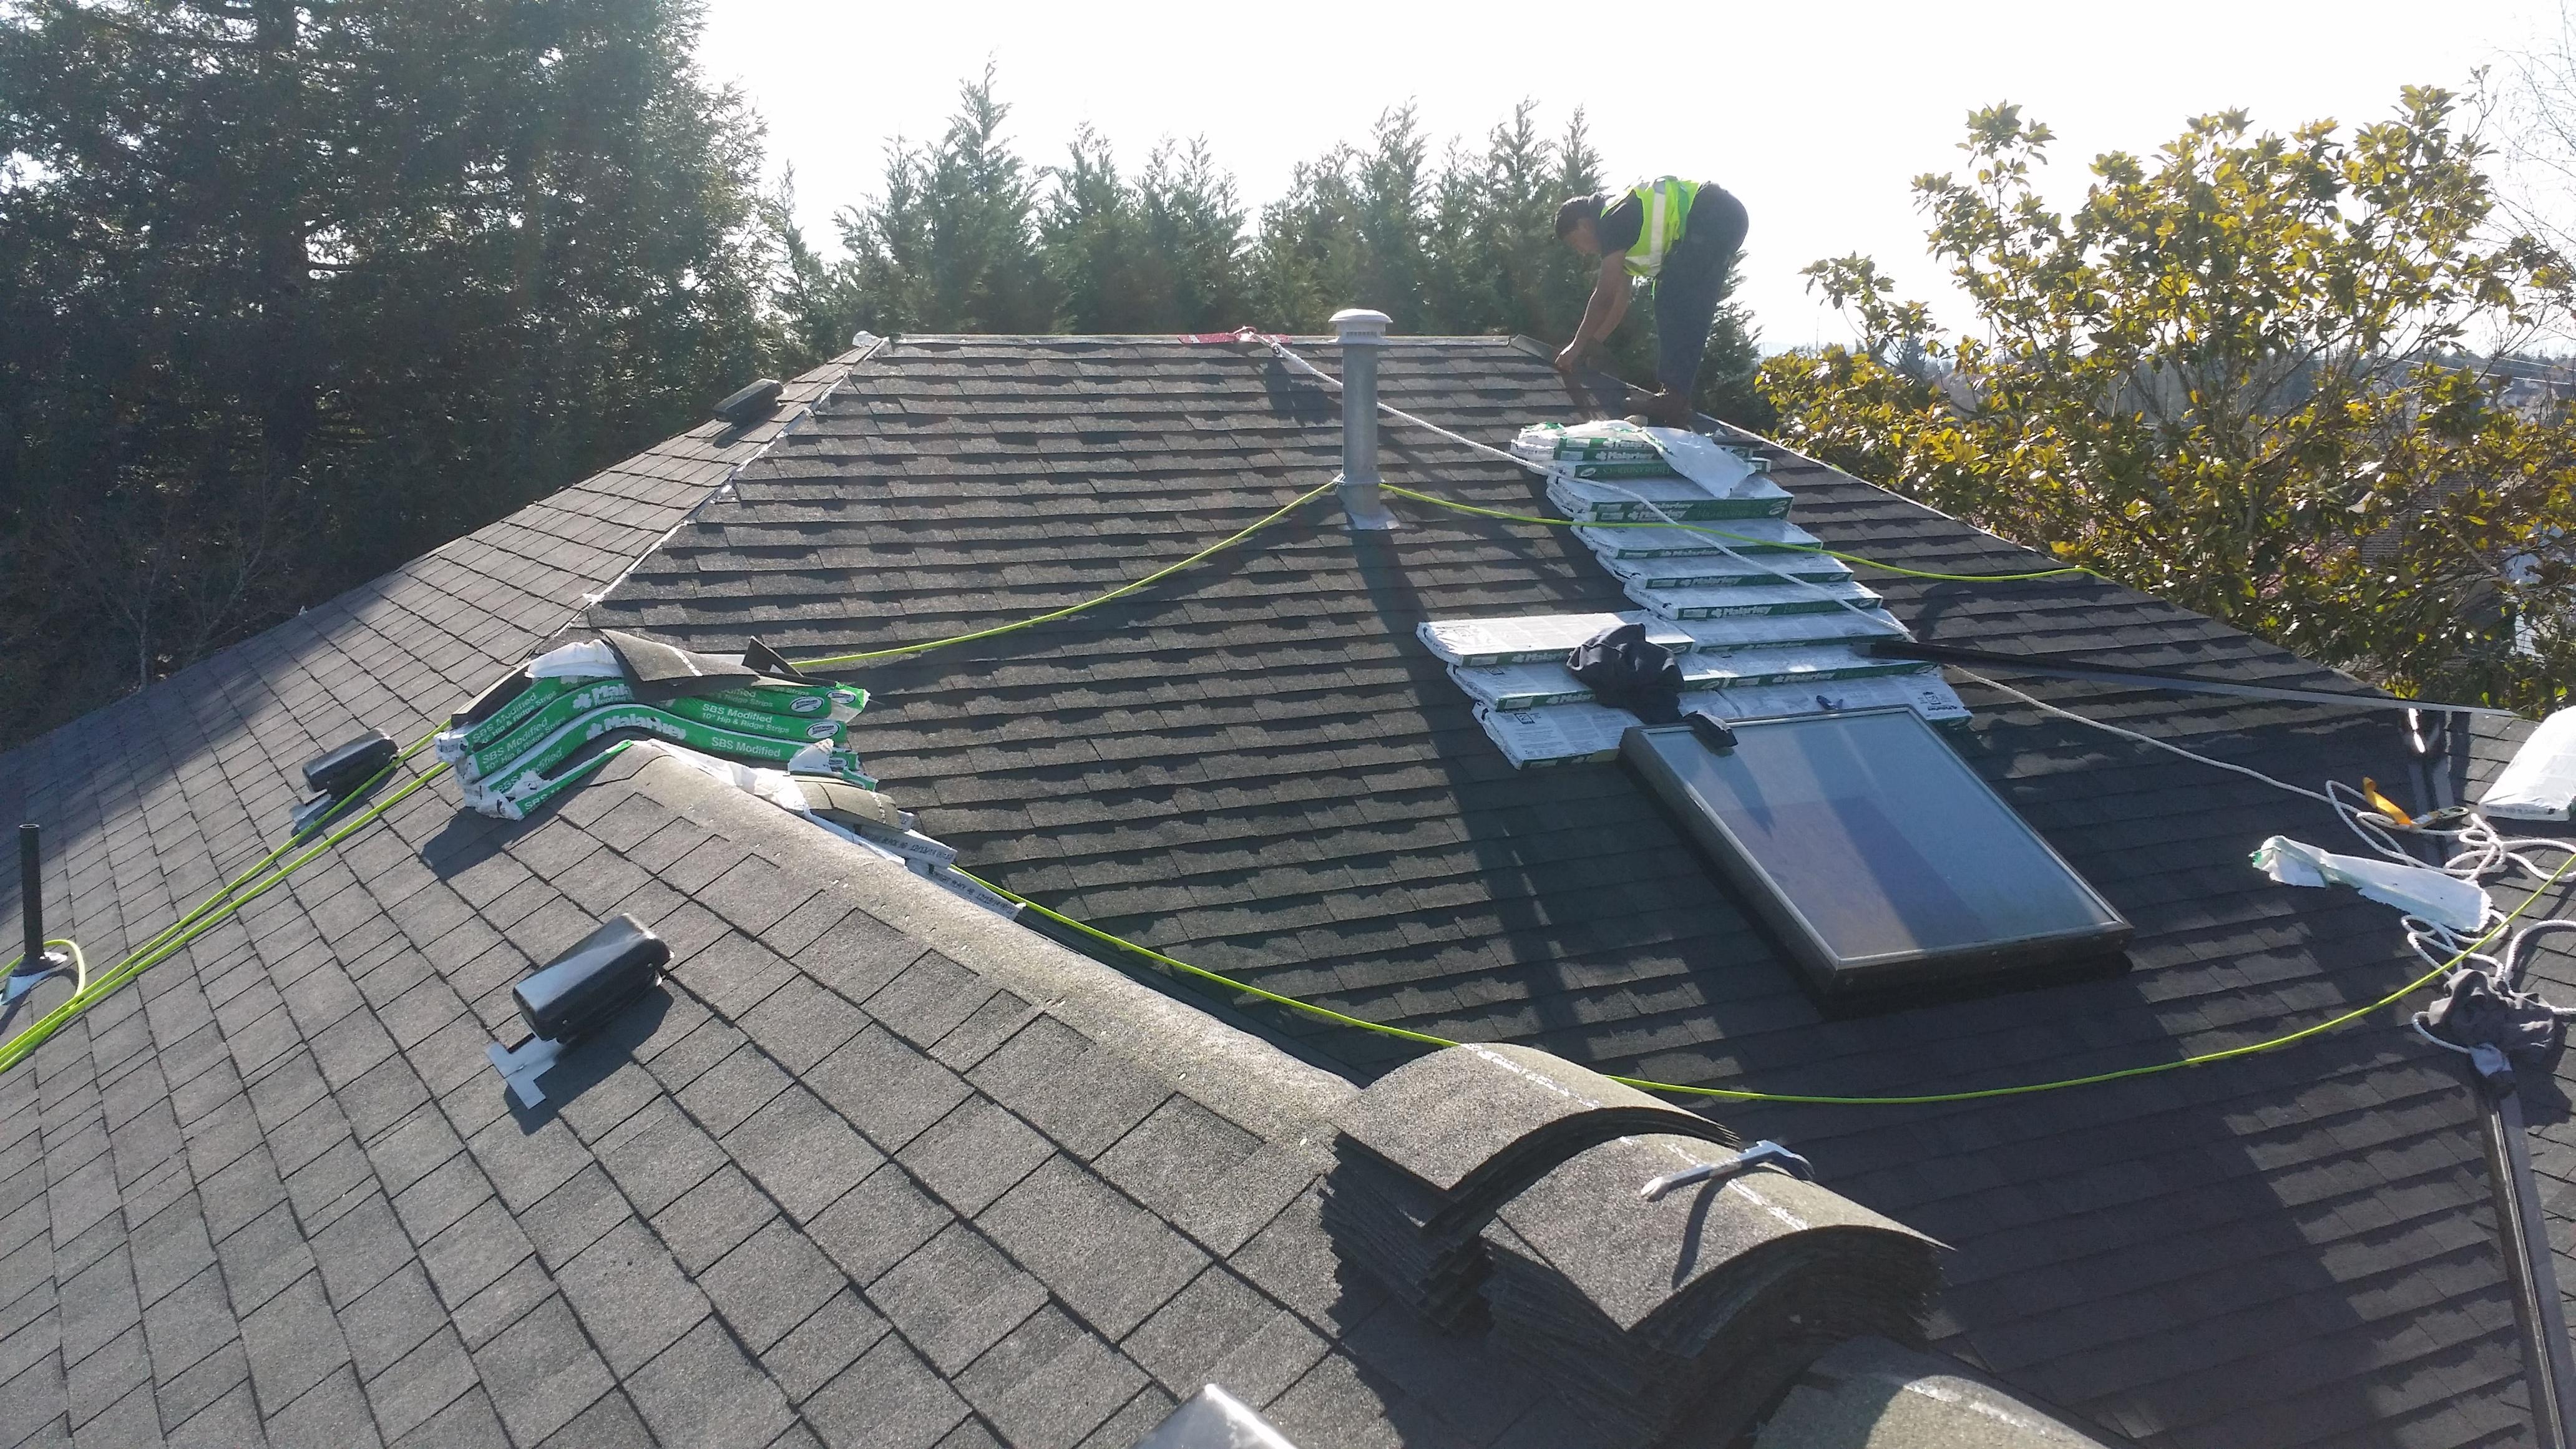 Roofing Rain OR Shine, LLC image 1